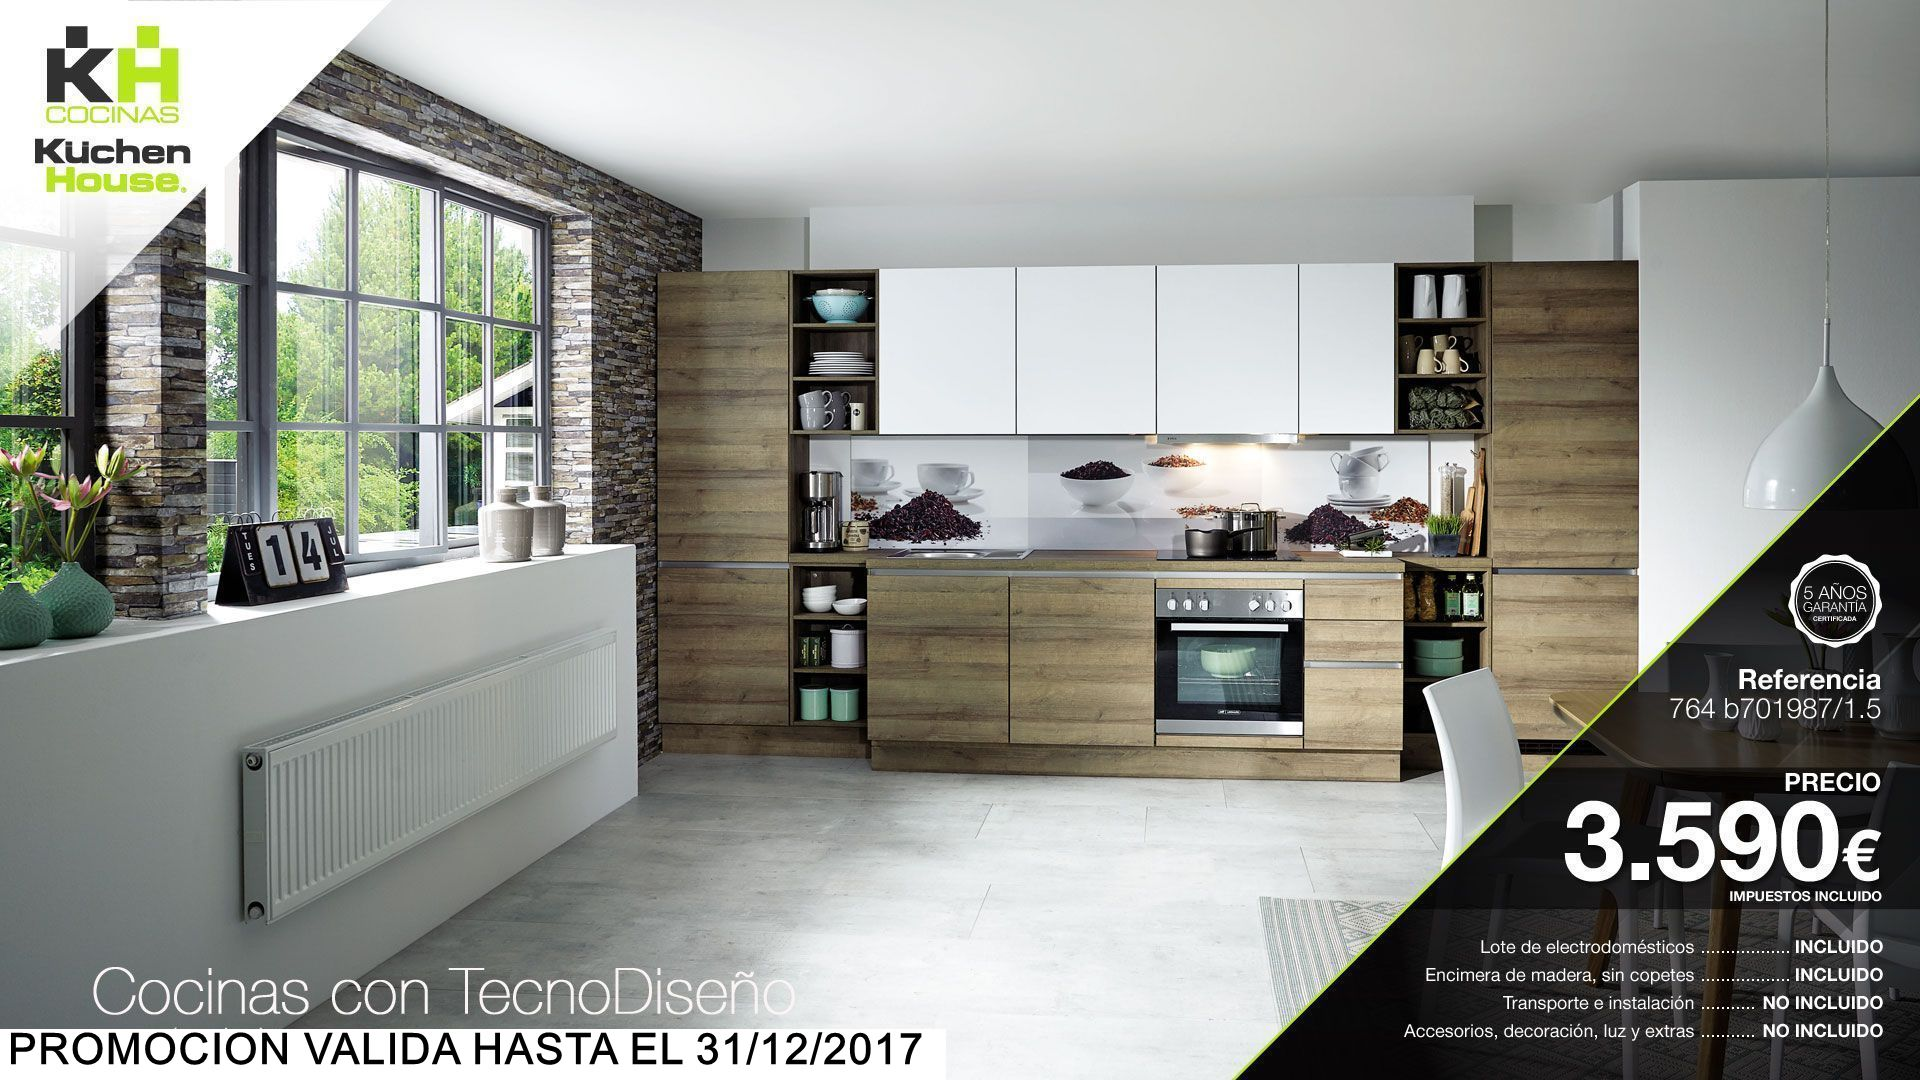 Cocinas kuchenhouse cocinas kuchenhouse oferta for Cocinas en oferta precios